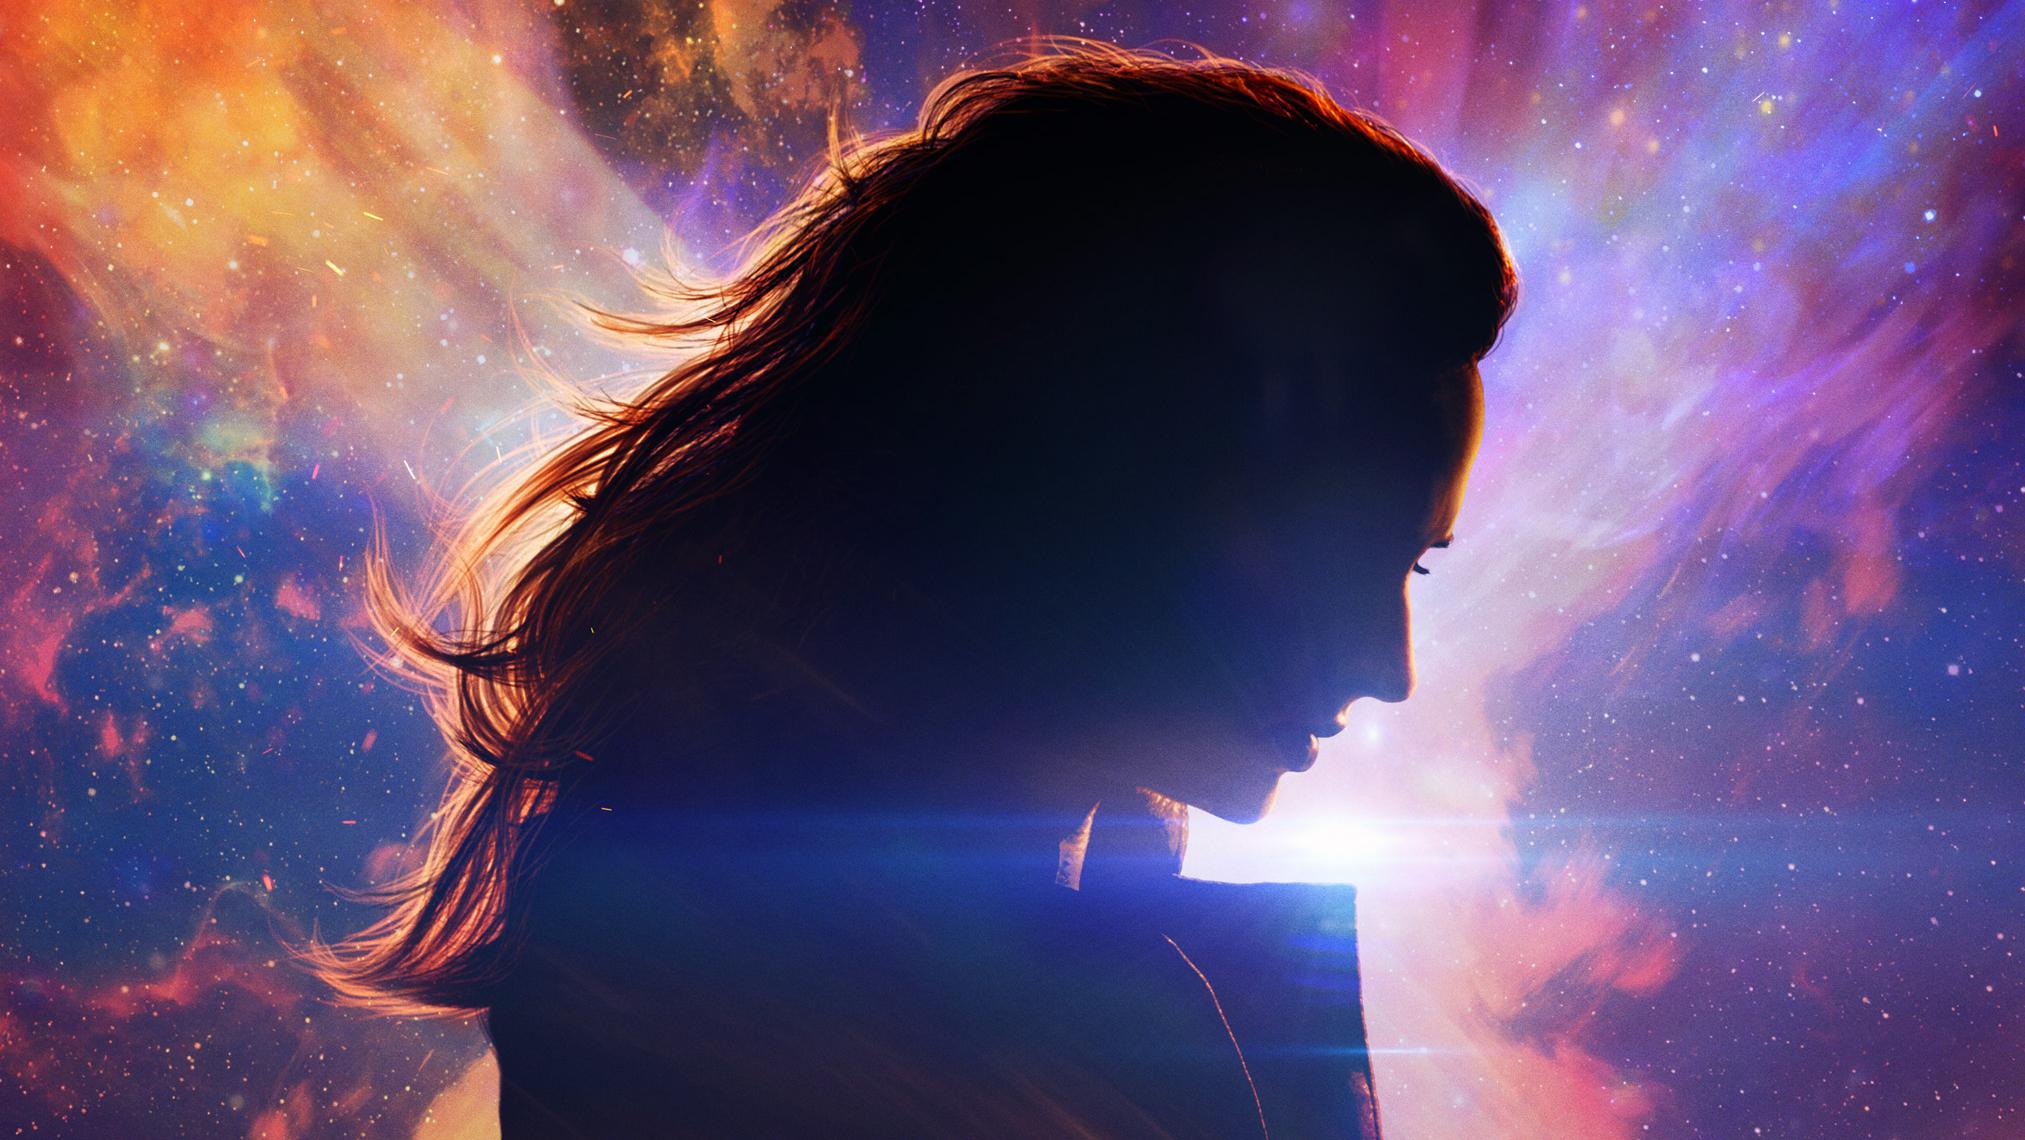 Dark Phoenix Hd Movies 4k Wallpapers Images Backgrounds